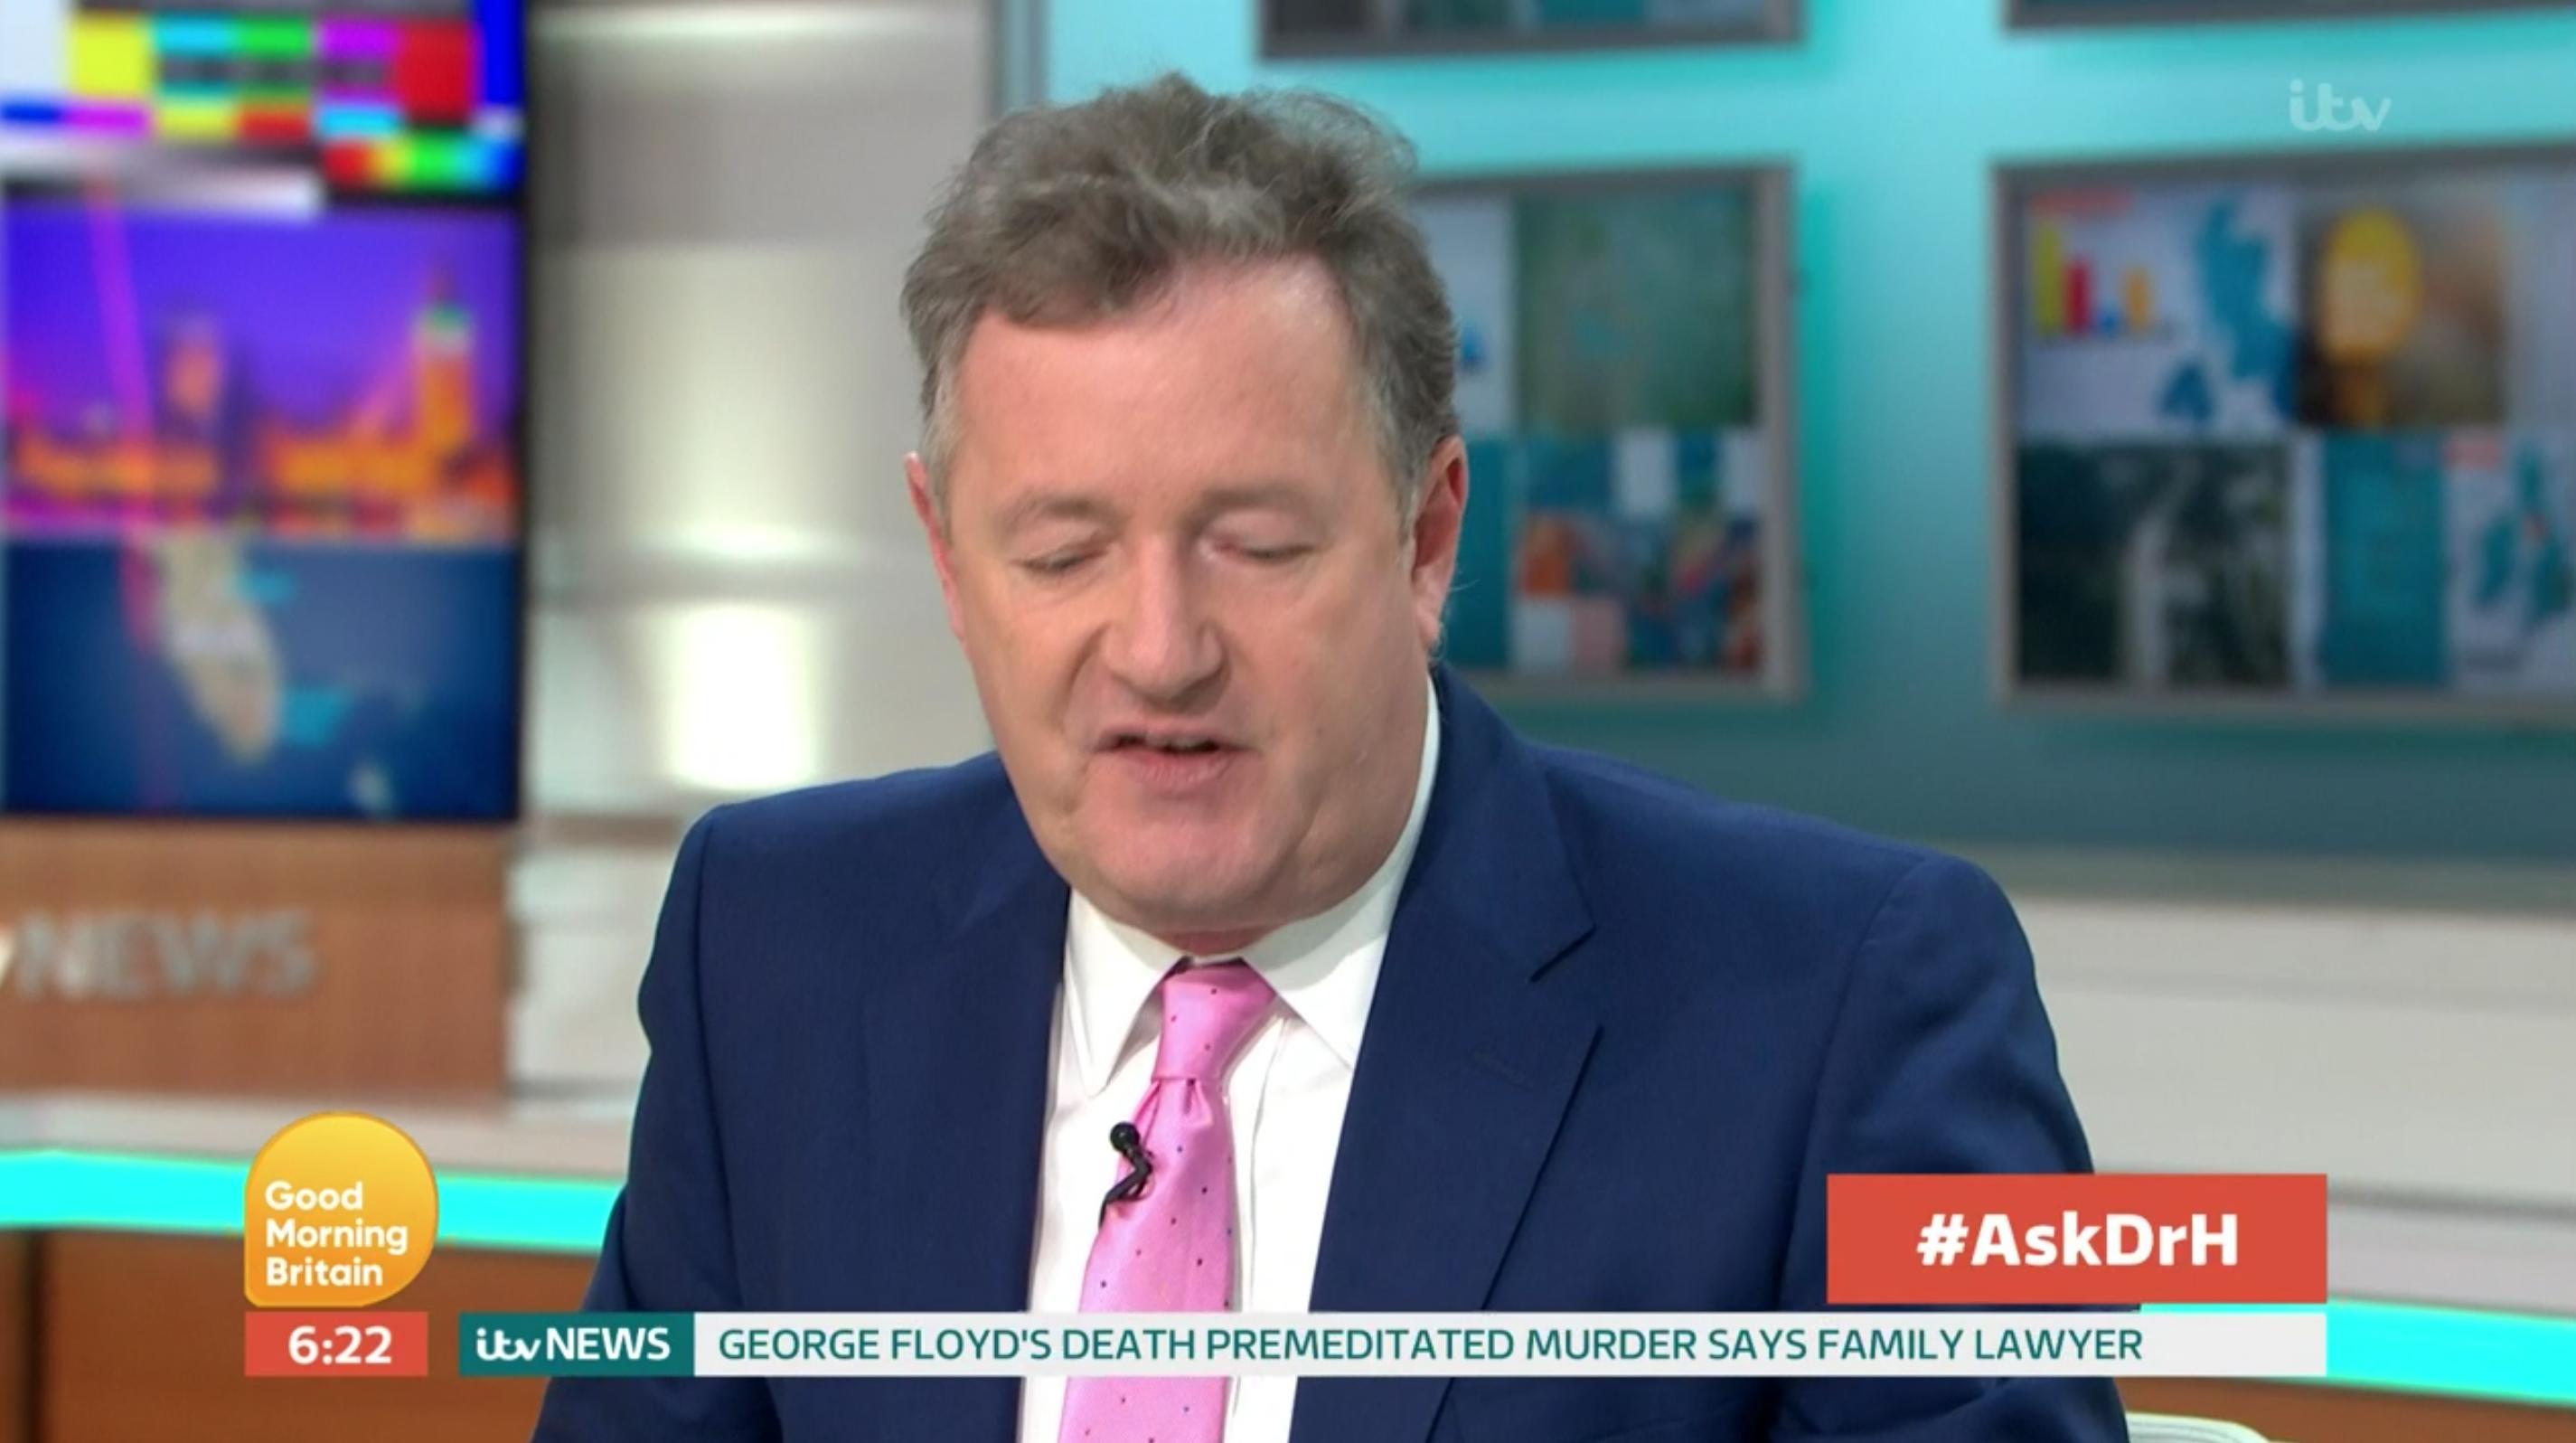 Piers Morgan Good Morning Britain return